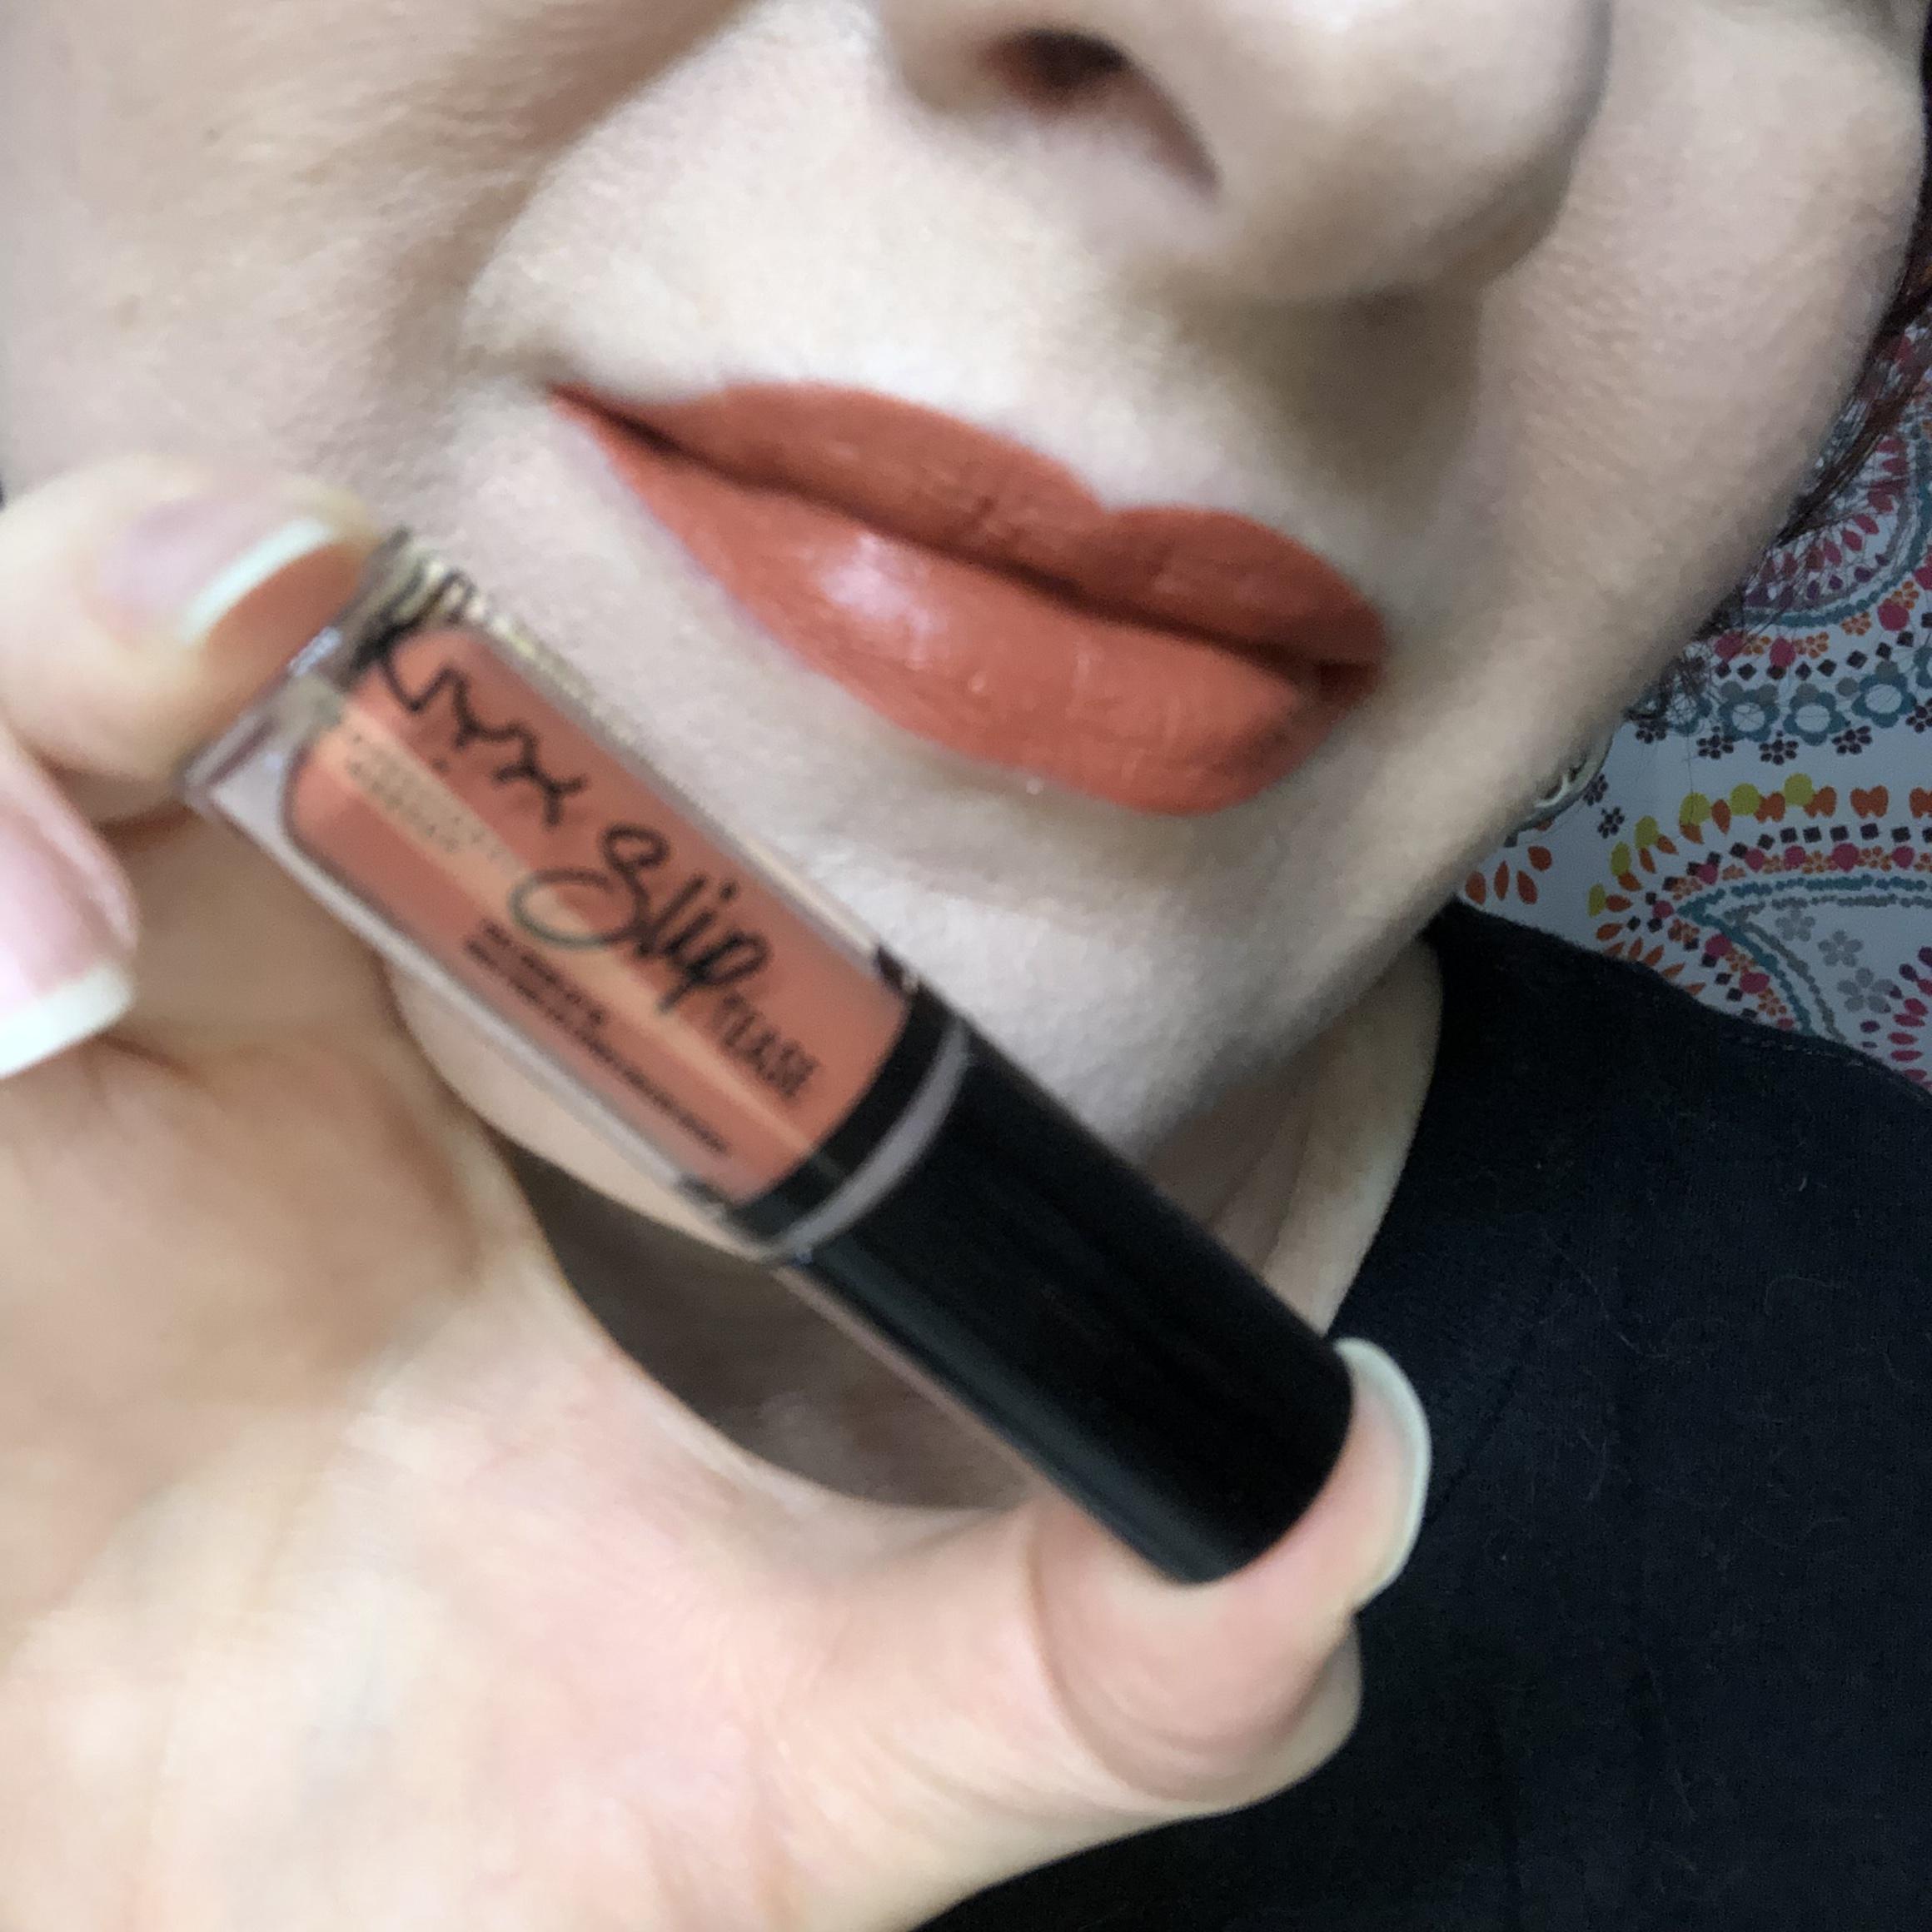 Nyx Sweet Chateau Slip Tease Lip Vault Cinnamoney Swatch